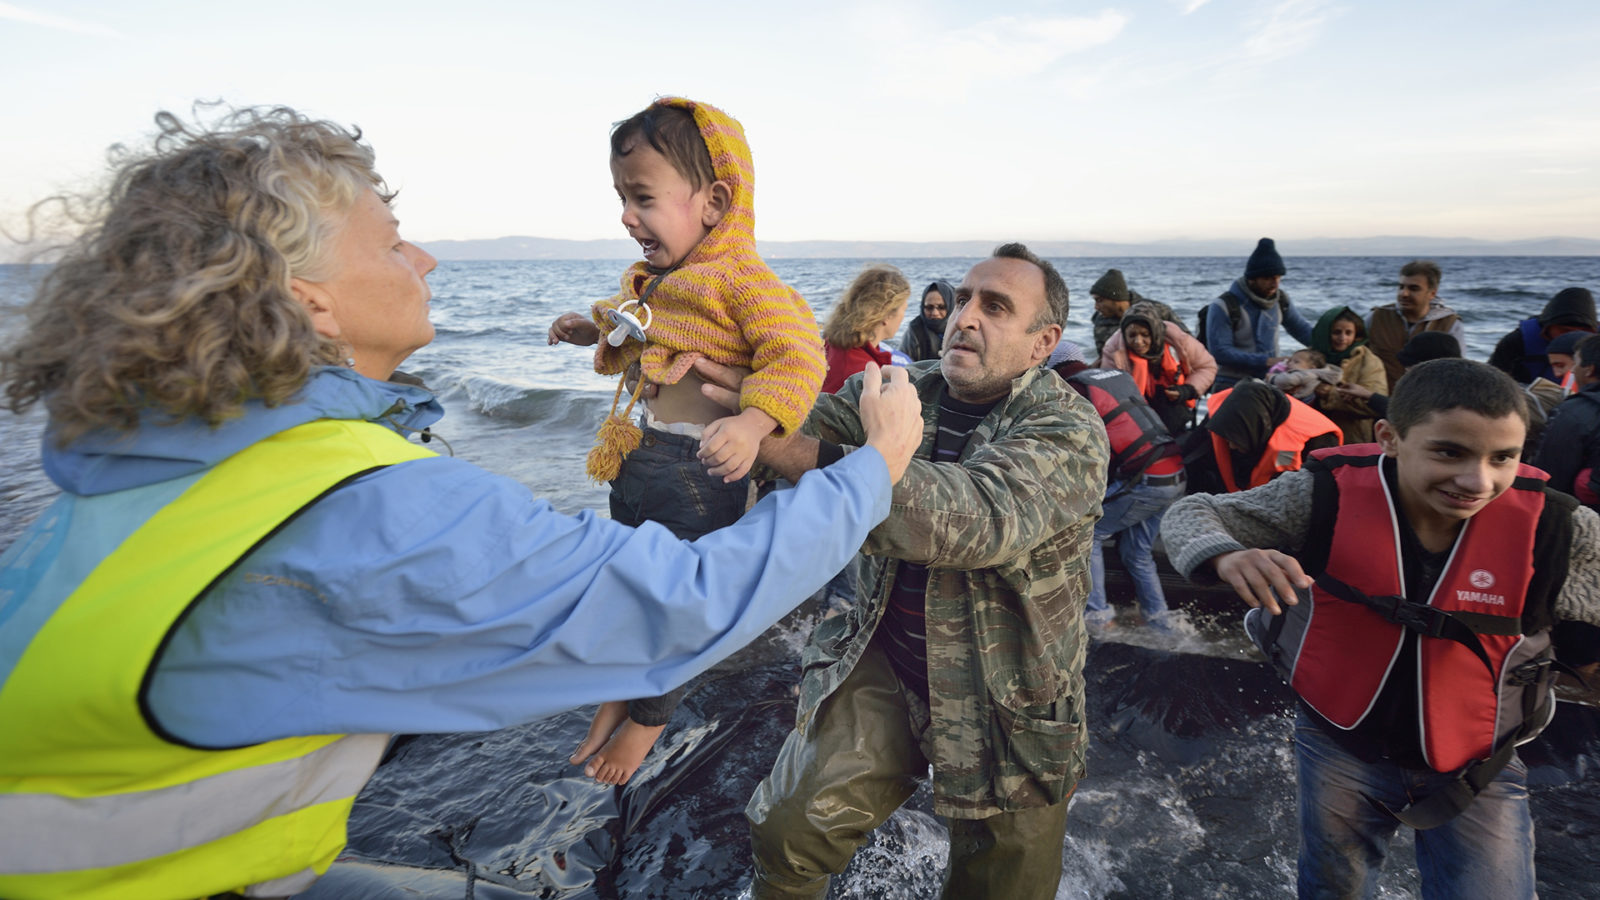 Refugees Cross Aegean Sea, Arrive On Greek Island